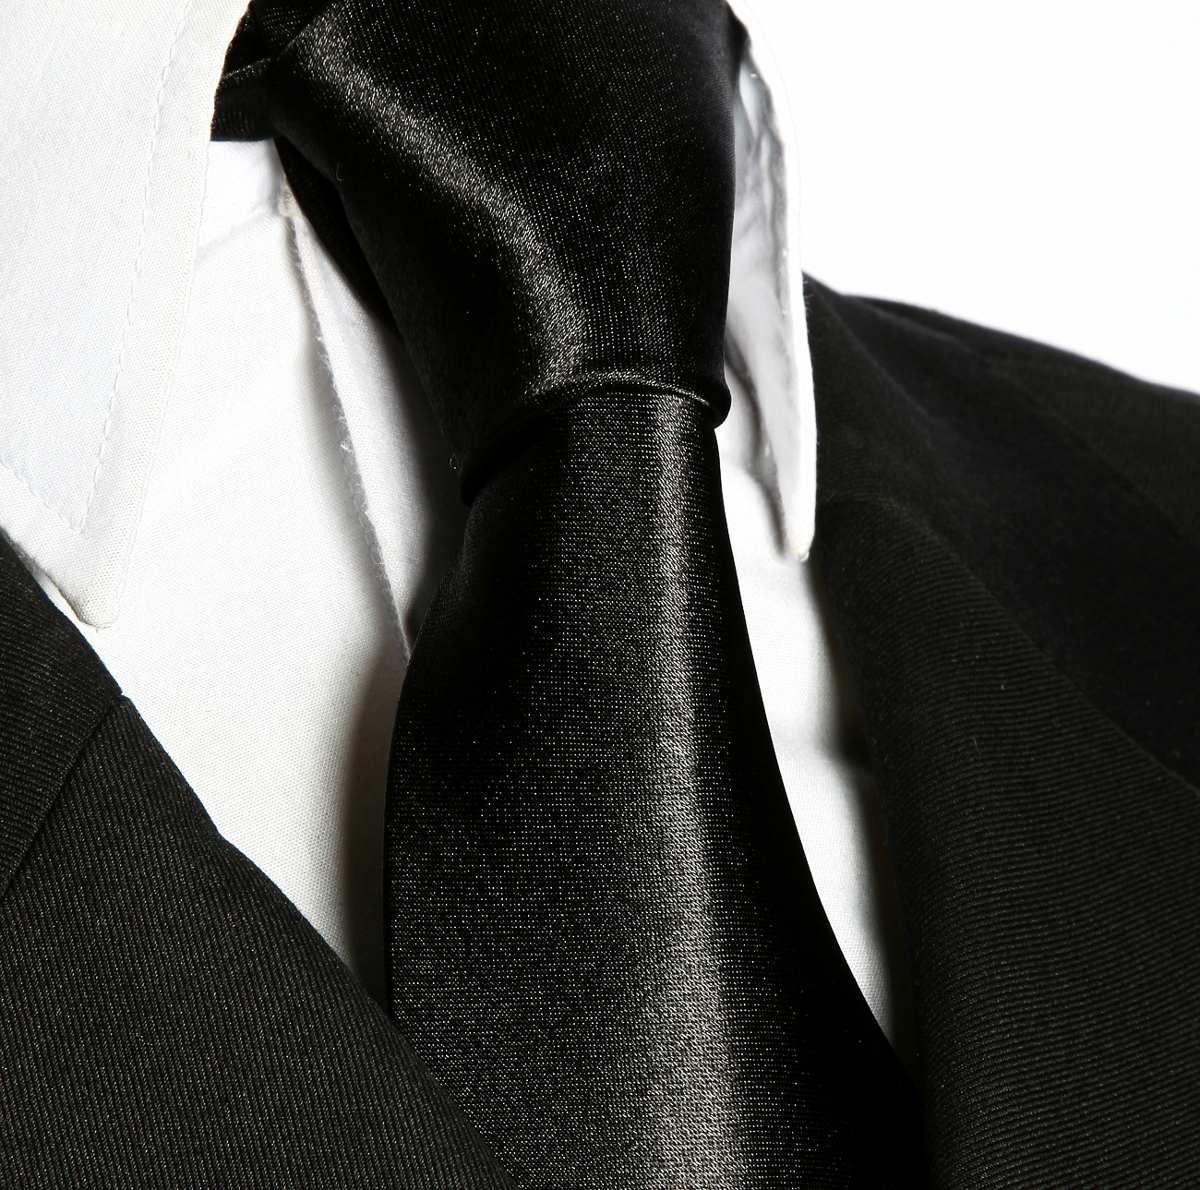 b99b08f531a 12 gravatas semi slim preta lisa sem nó. Carregando zoom.